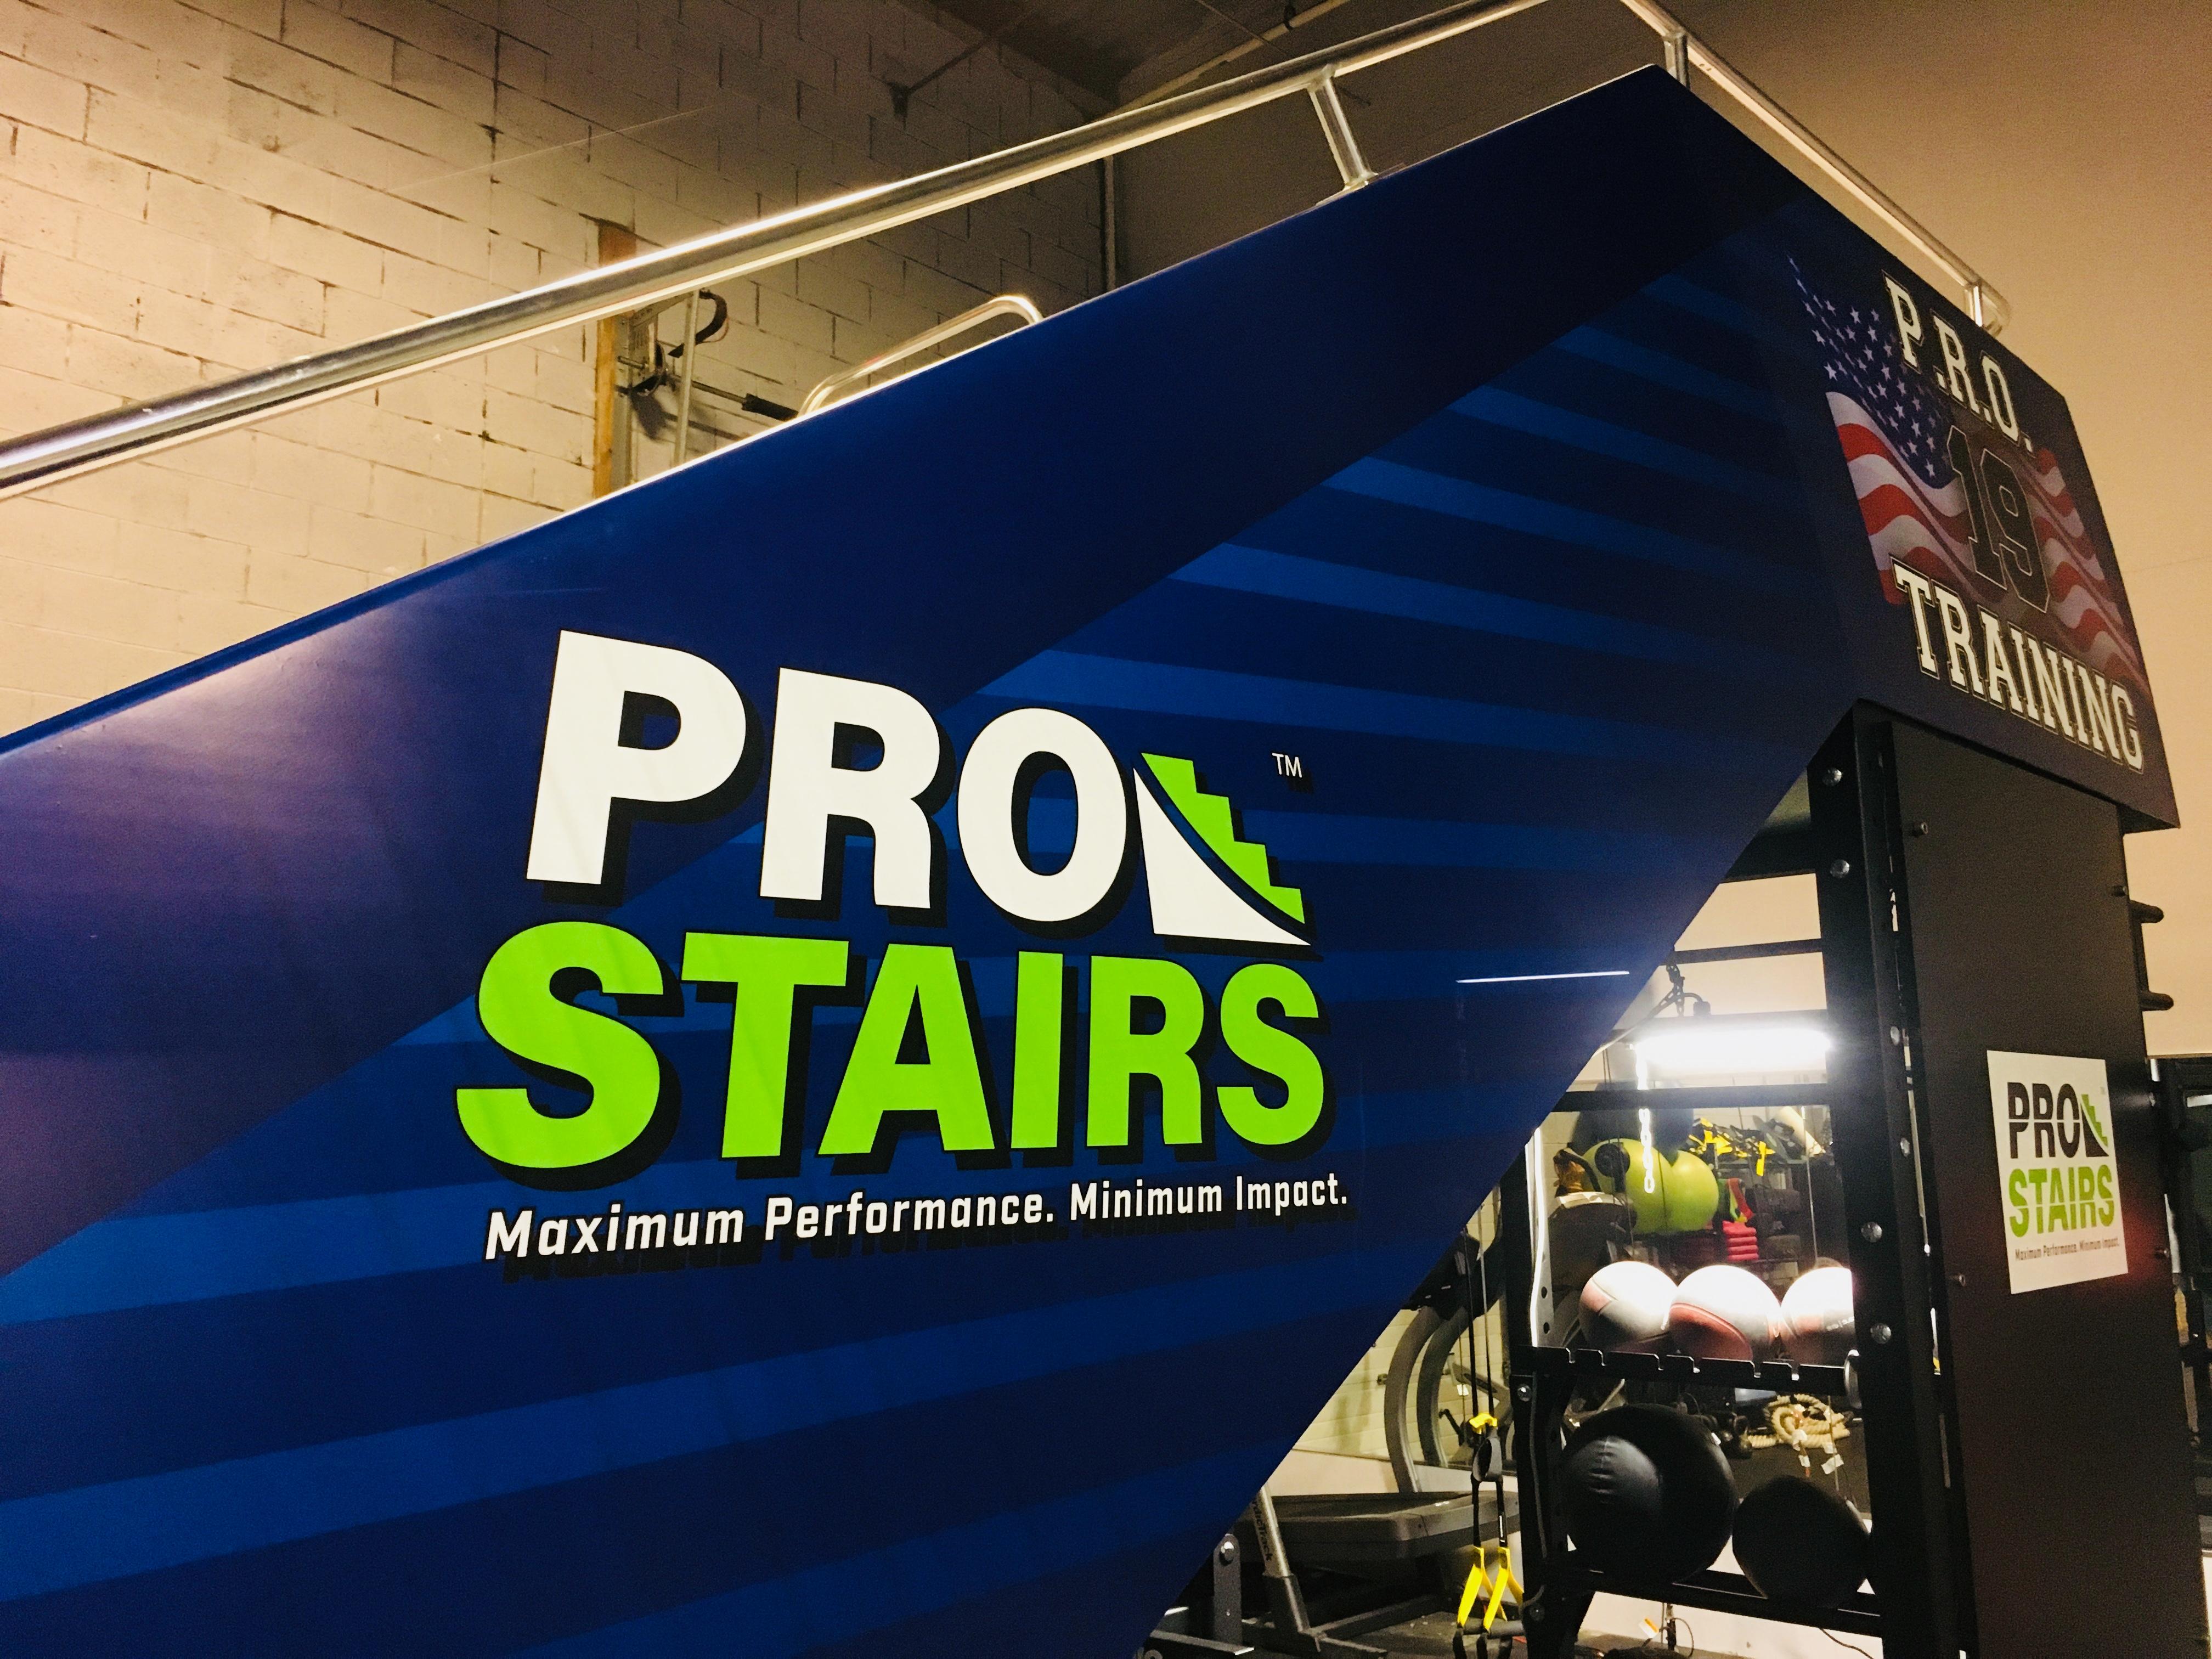 ProStairs   Maximum Performance  Minimum Impact